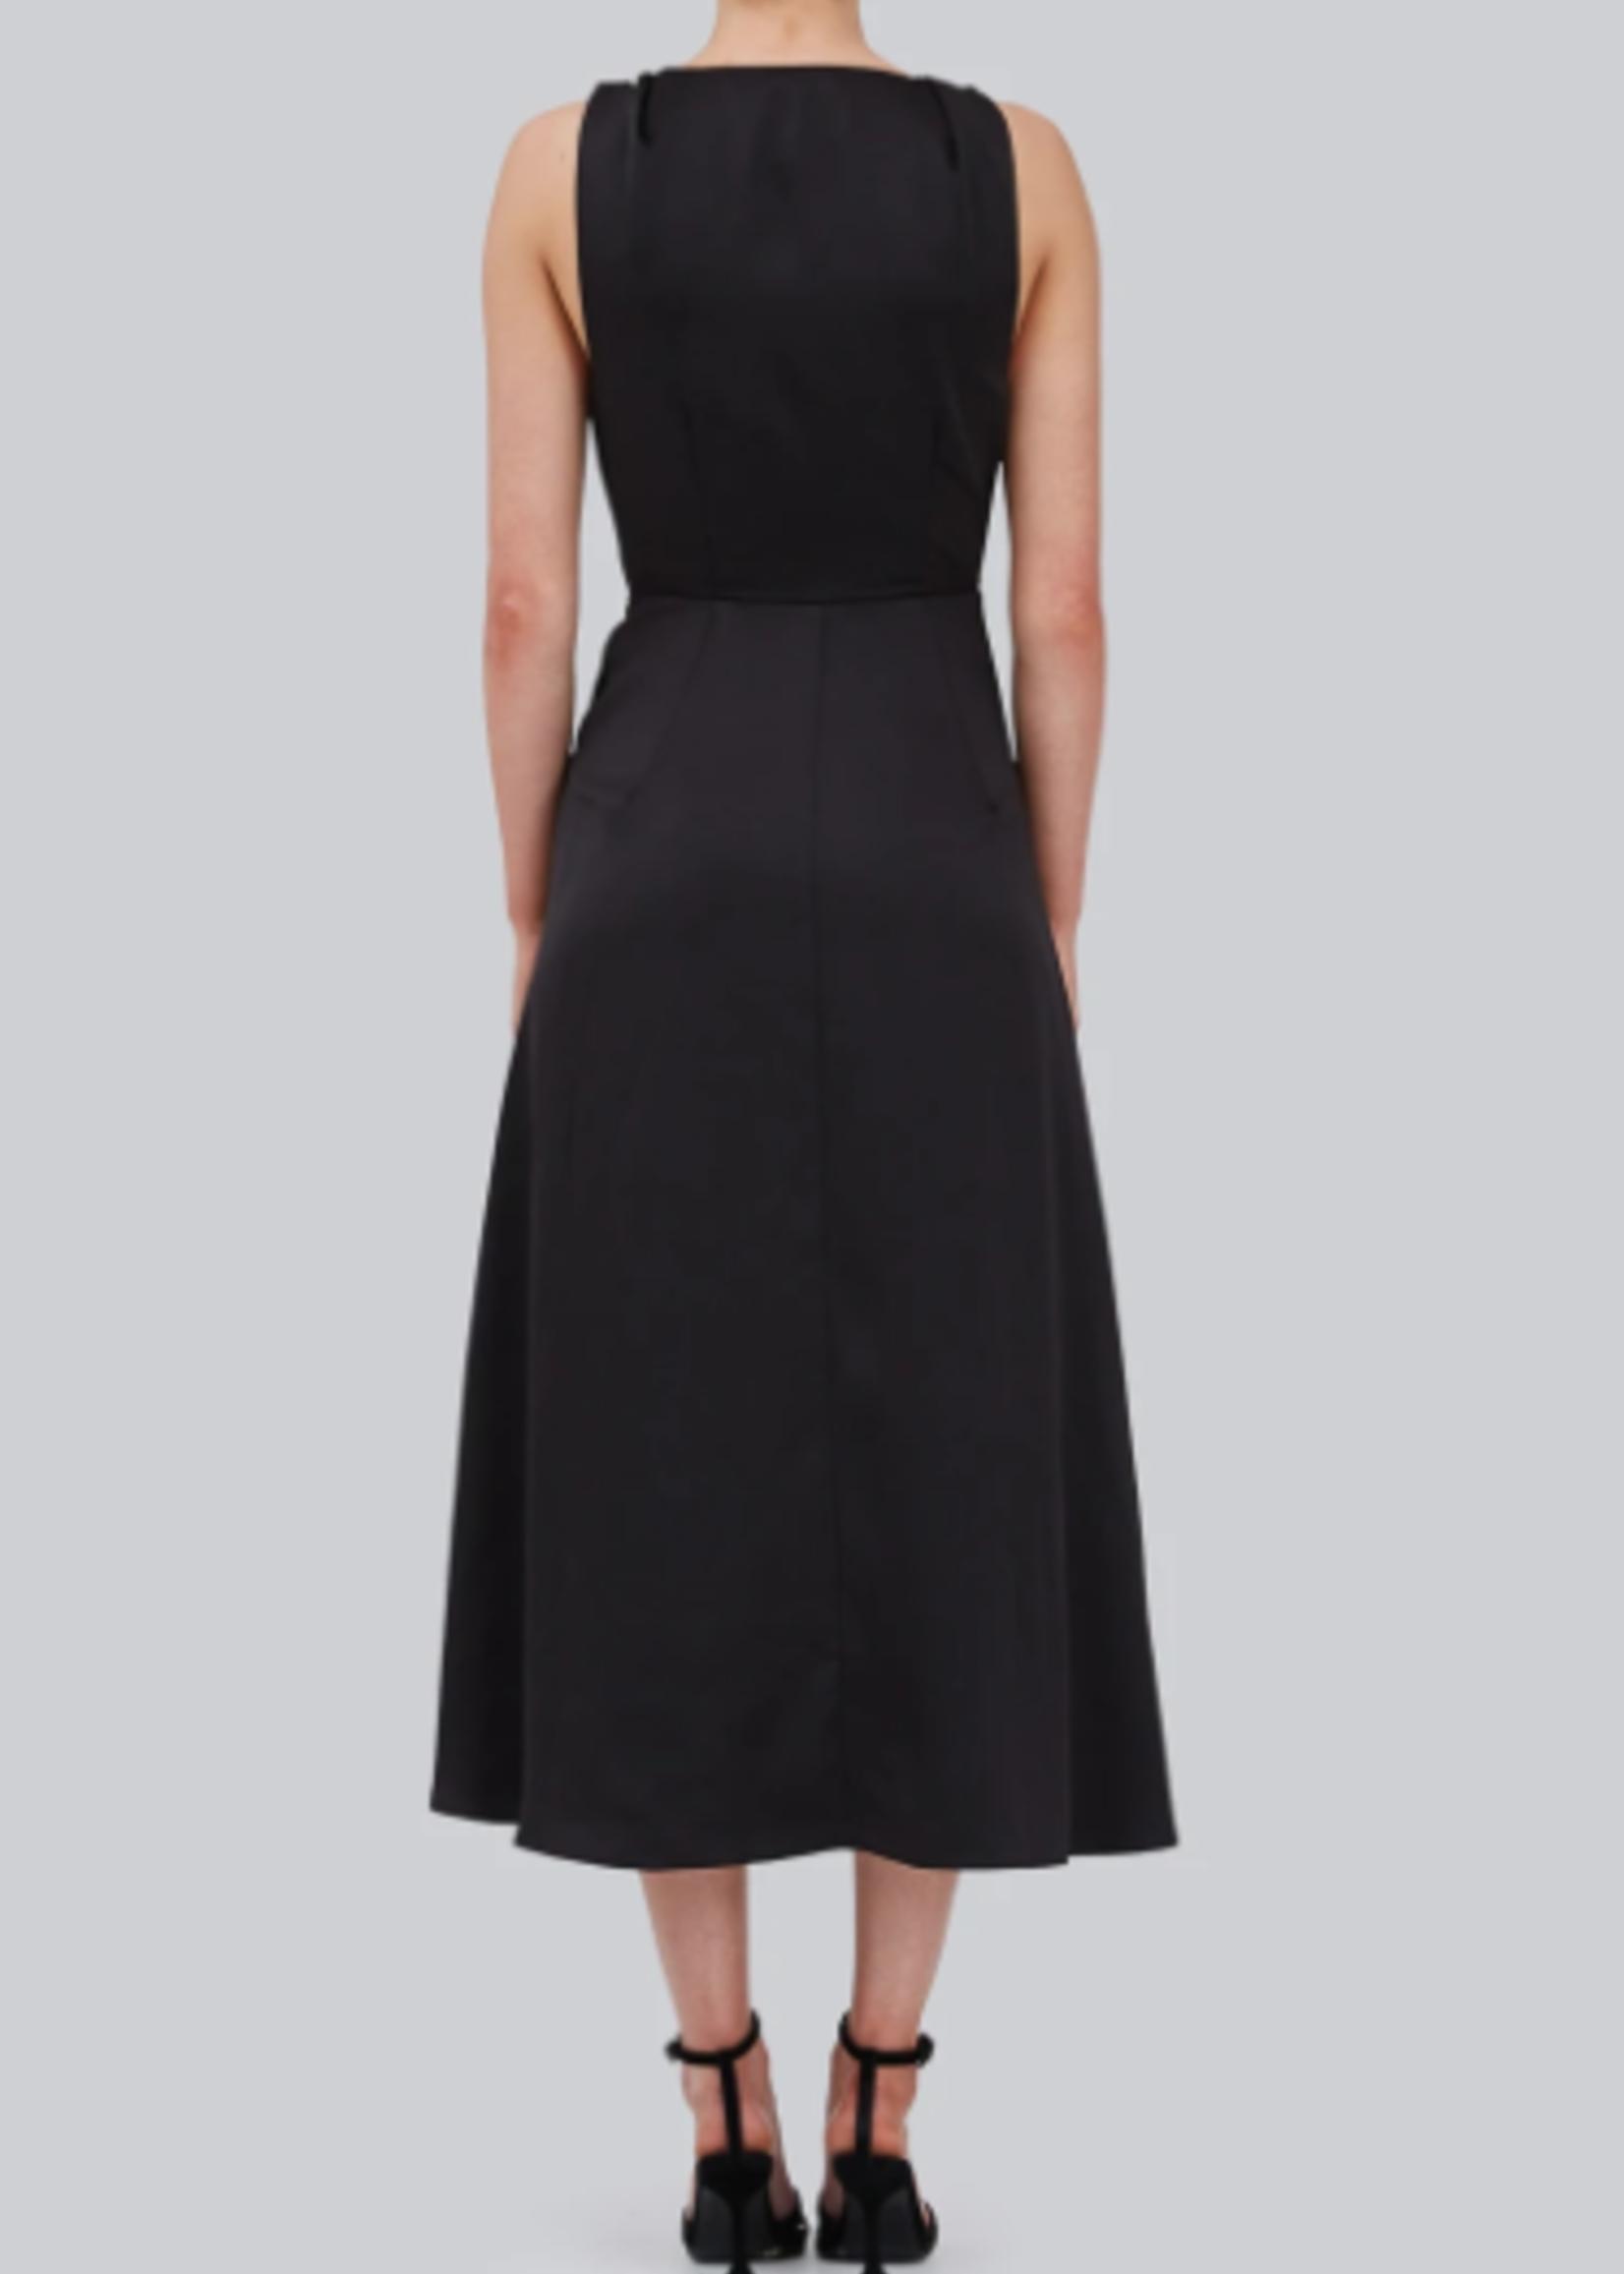 Elitaire Boutique Burning Midi Dress Black